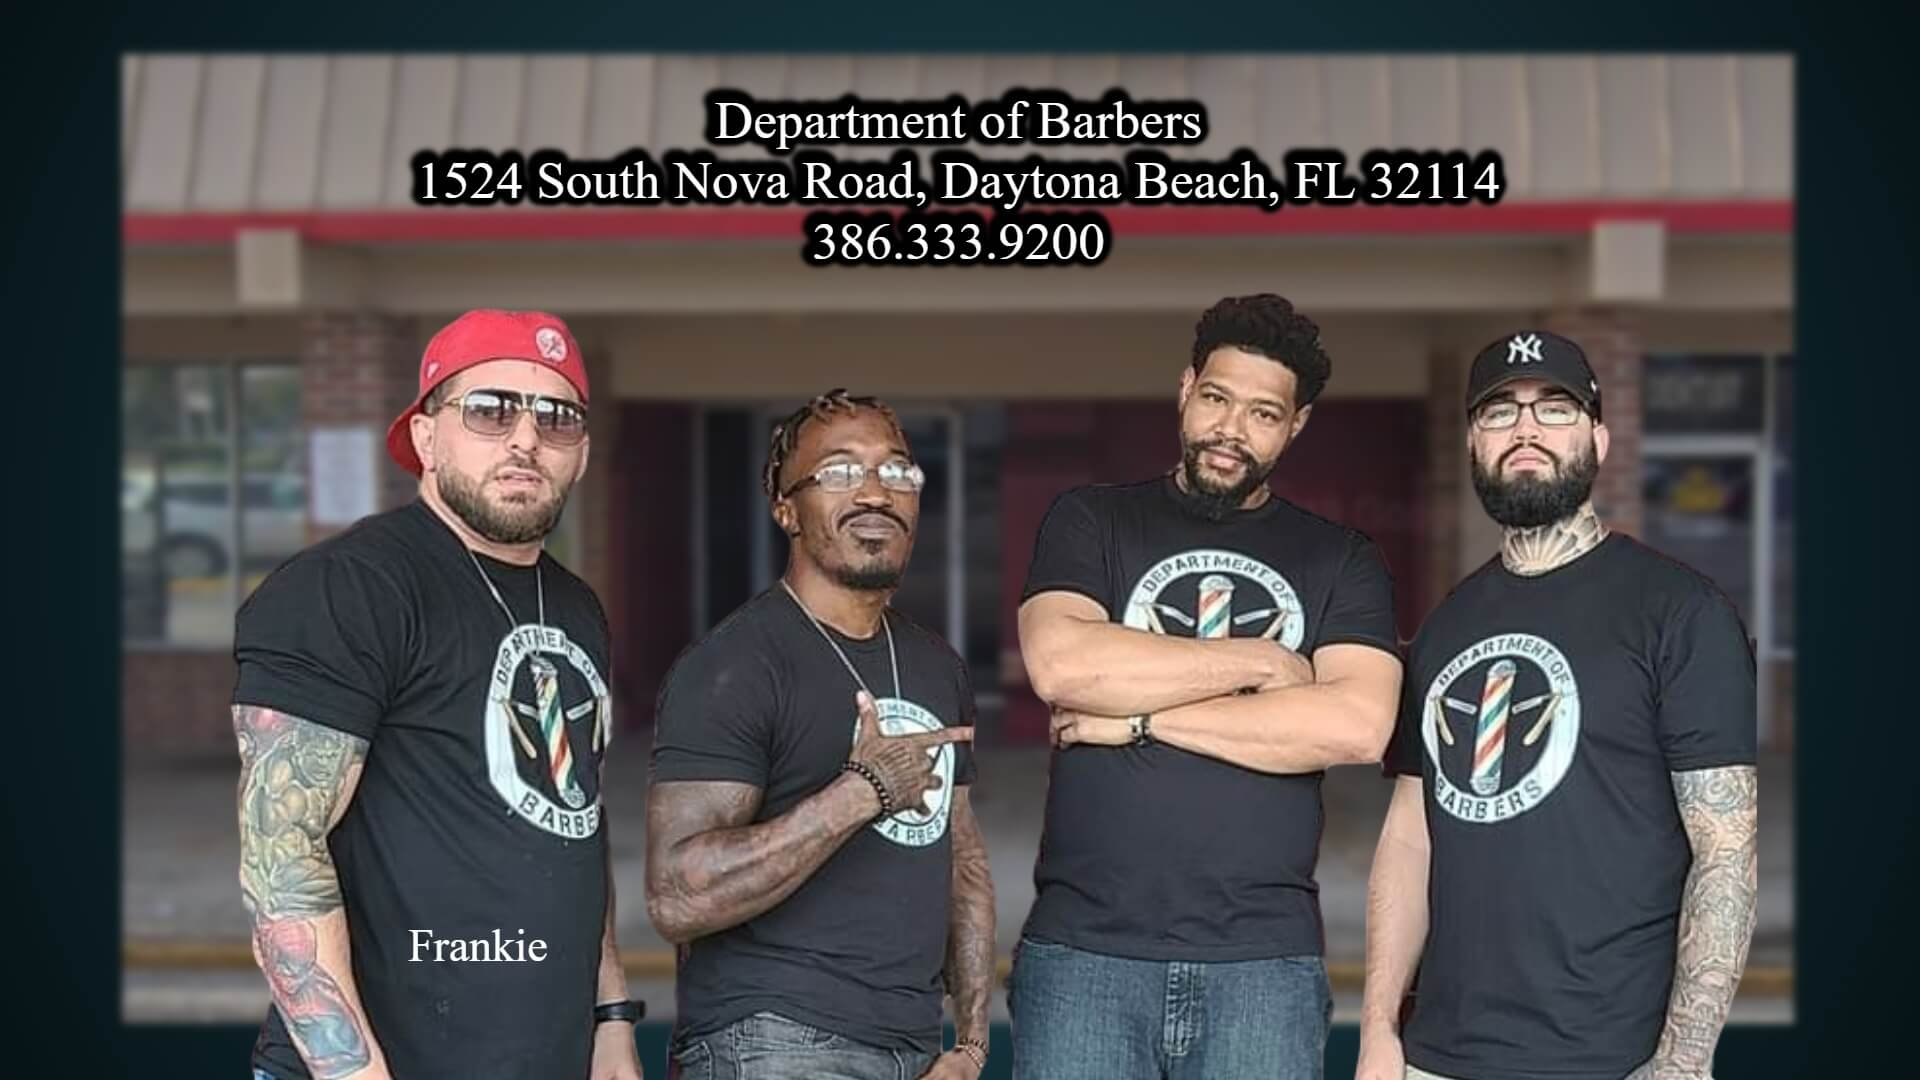 Department of Barbers Daytona Beach Florida